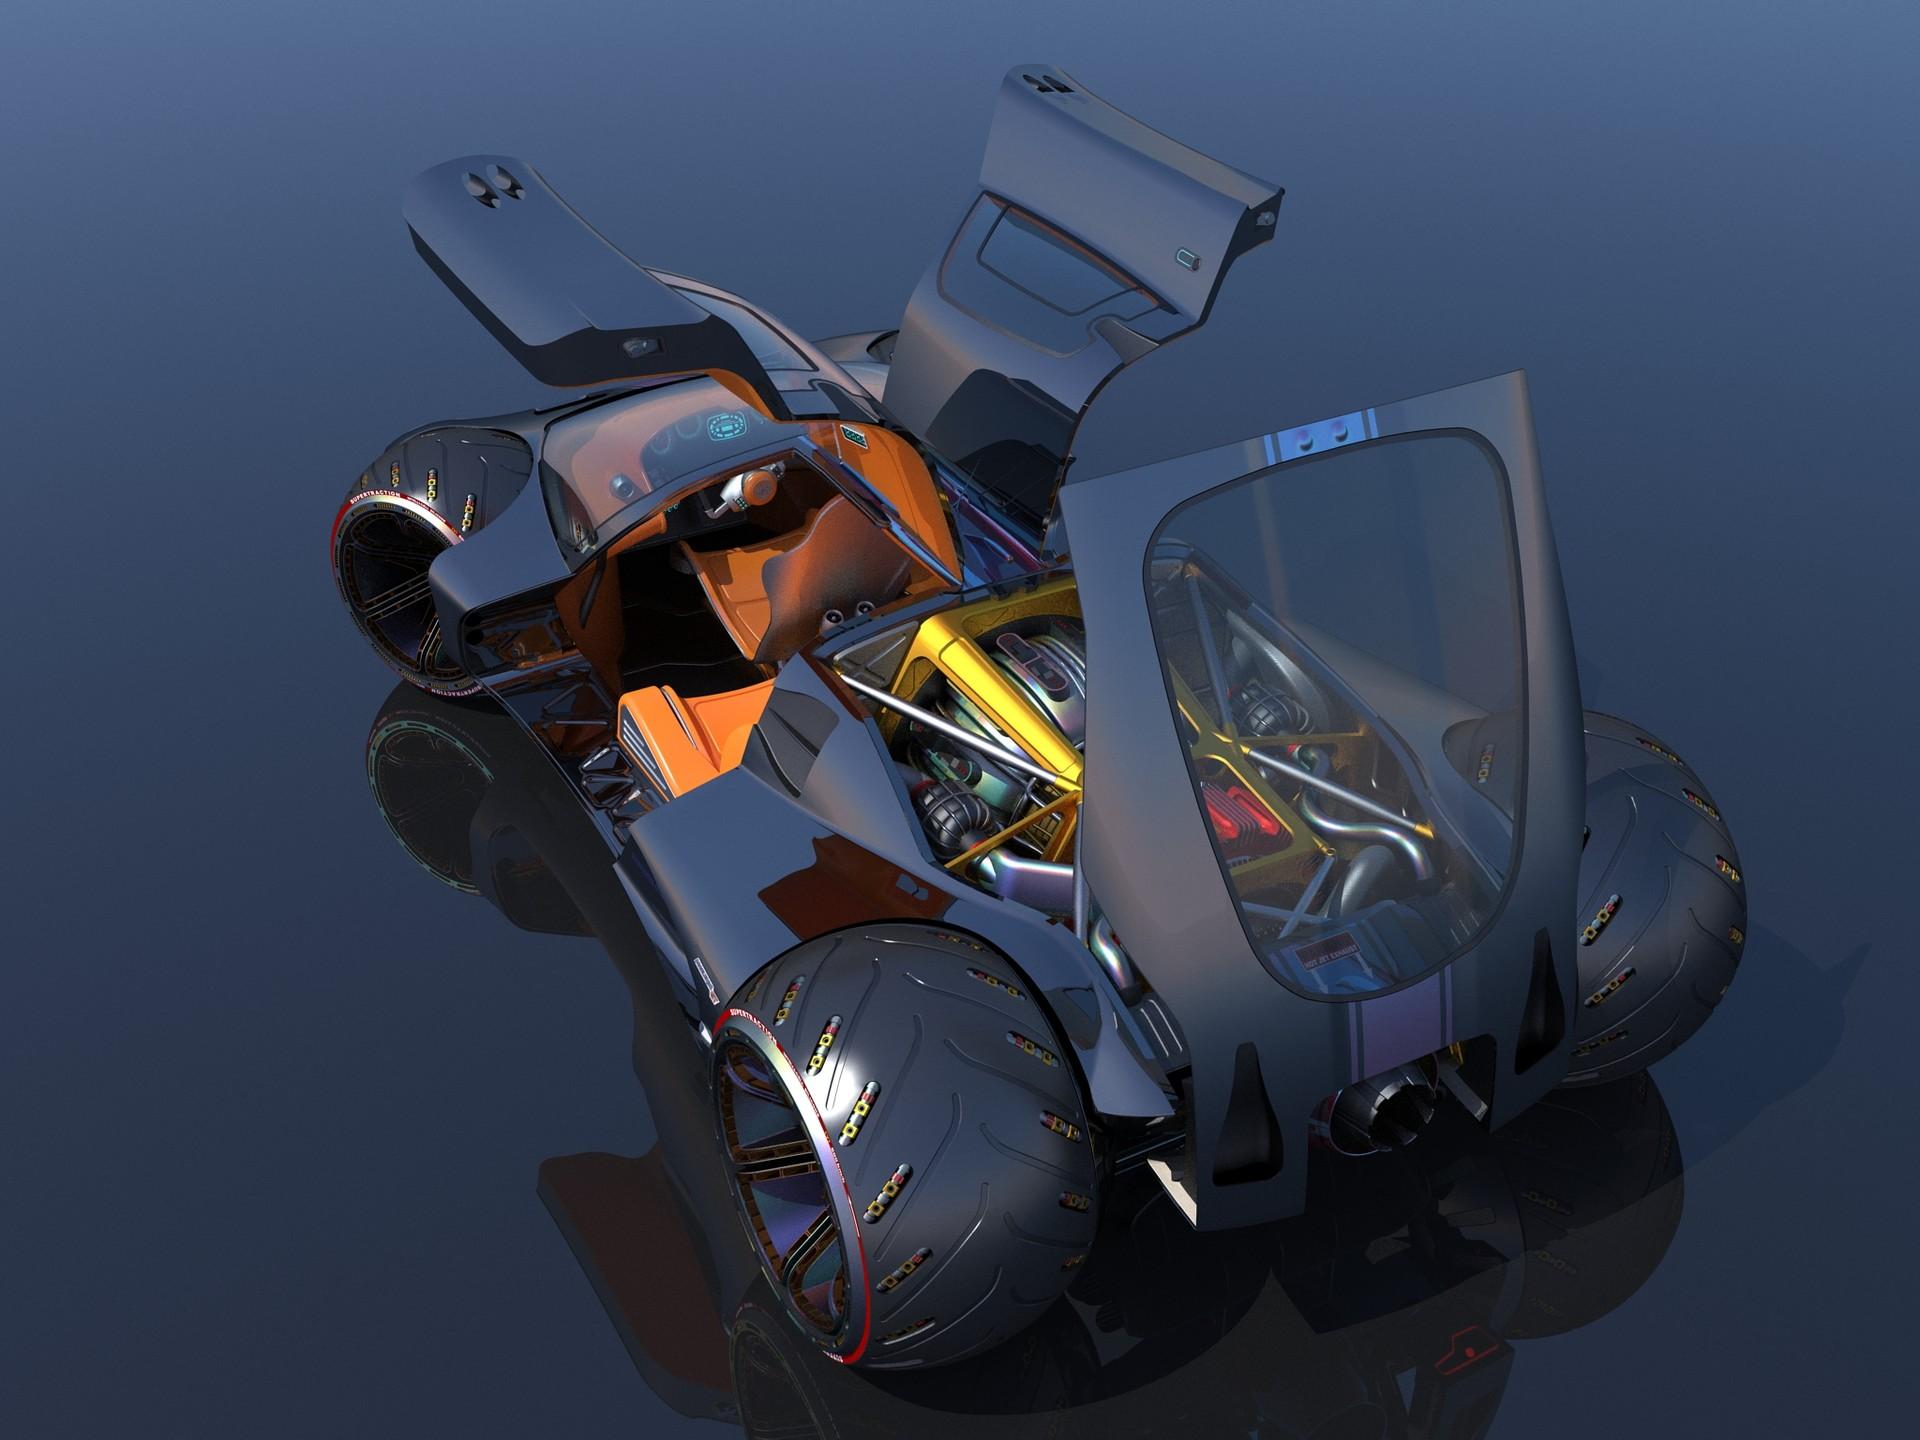 Joachim sverd supercar concept44 doors open